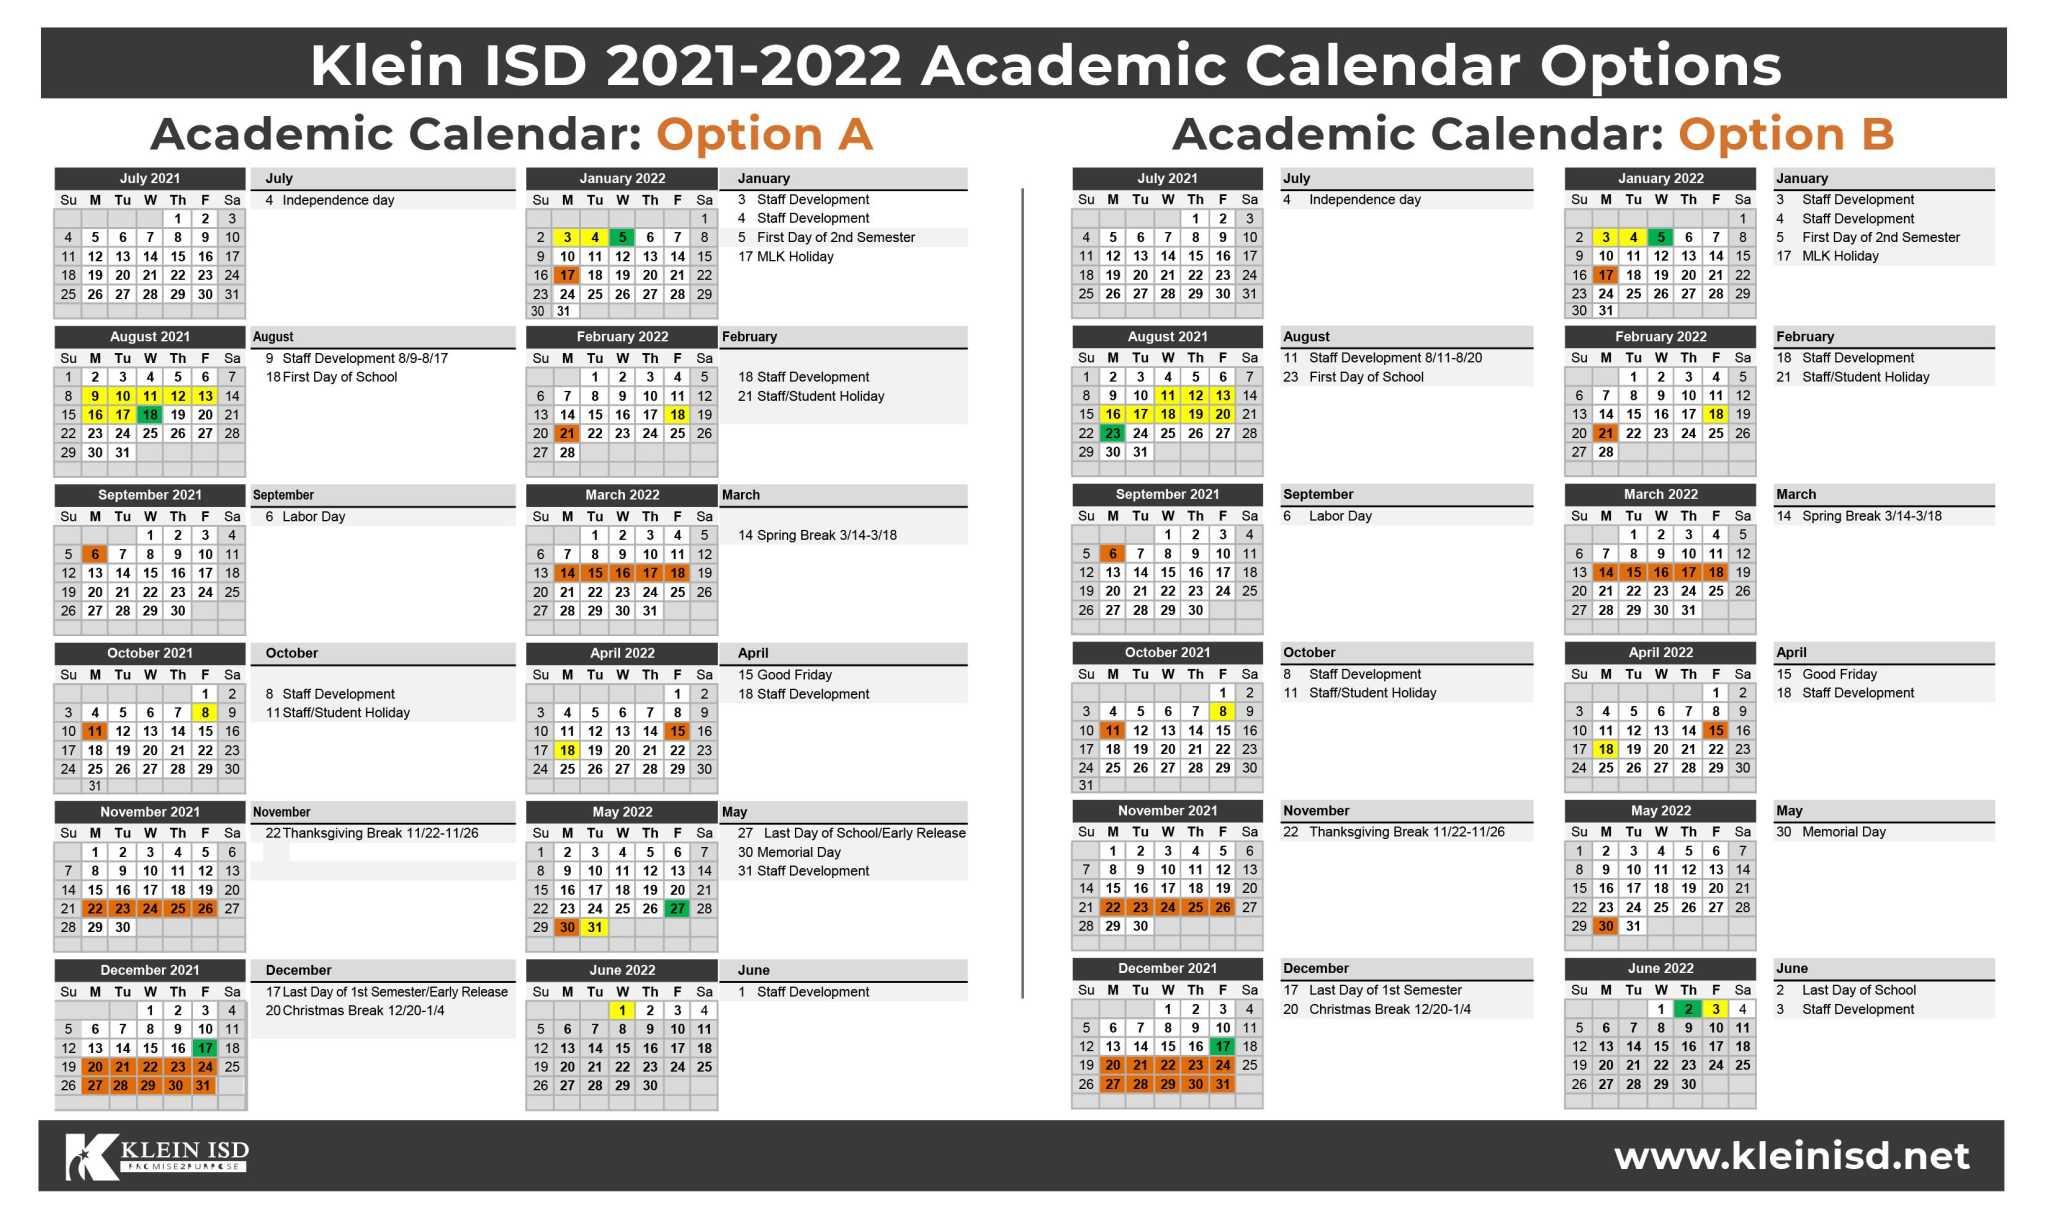 Klein Isd Calendar 2022.Spring Klein School Notebook Klein Isd Asks For Feedback On 2021 2022 Academic Calendar